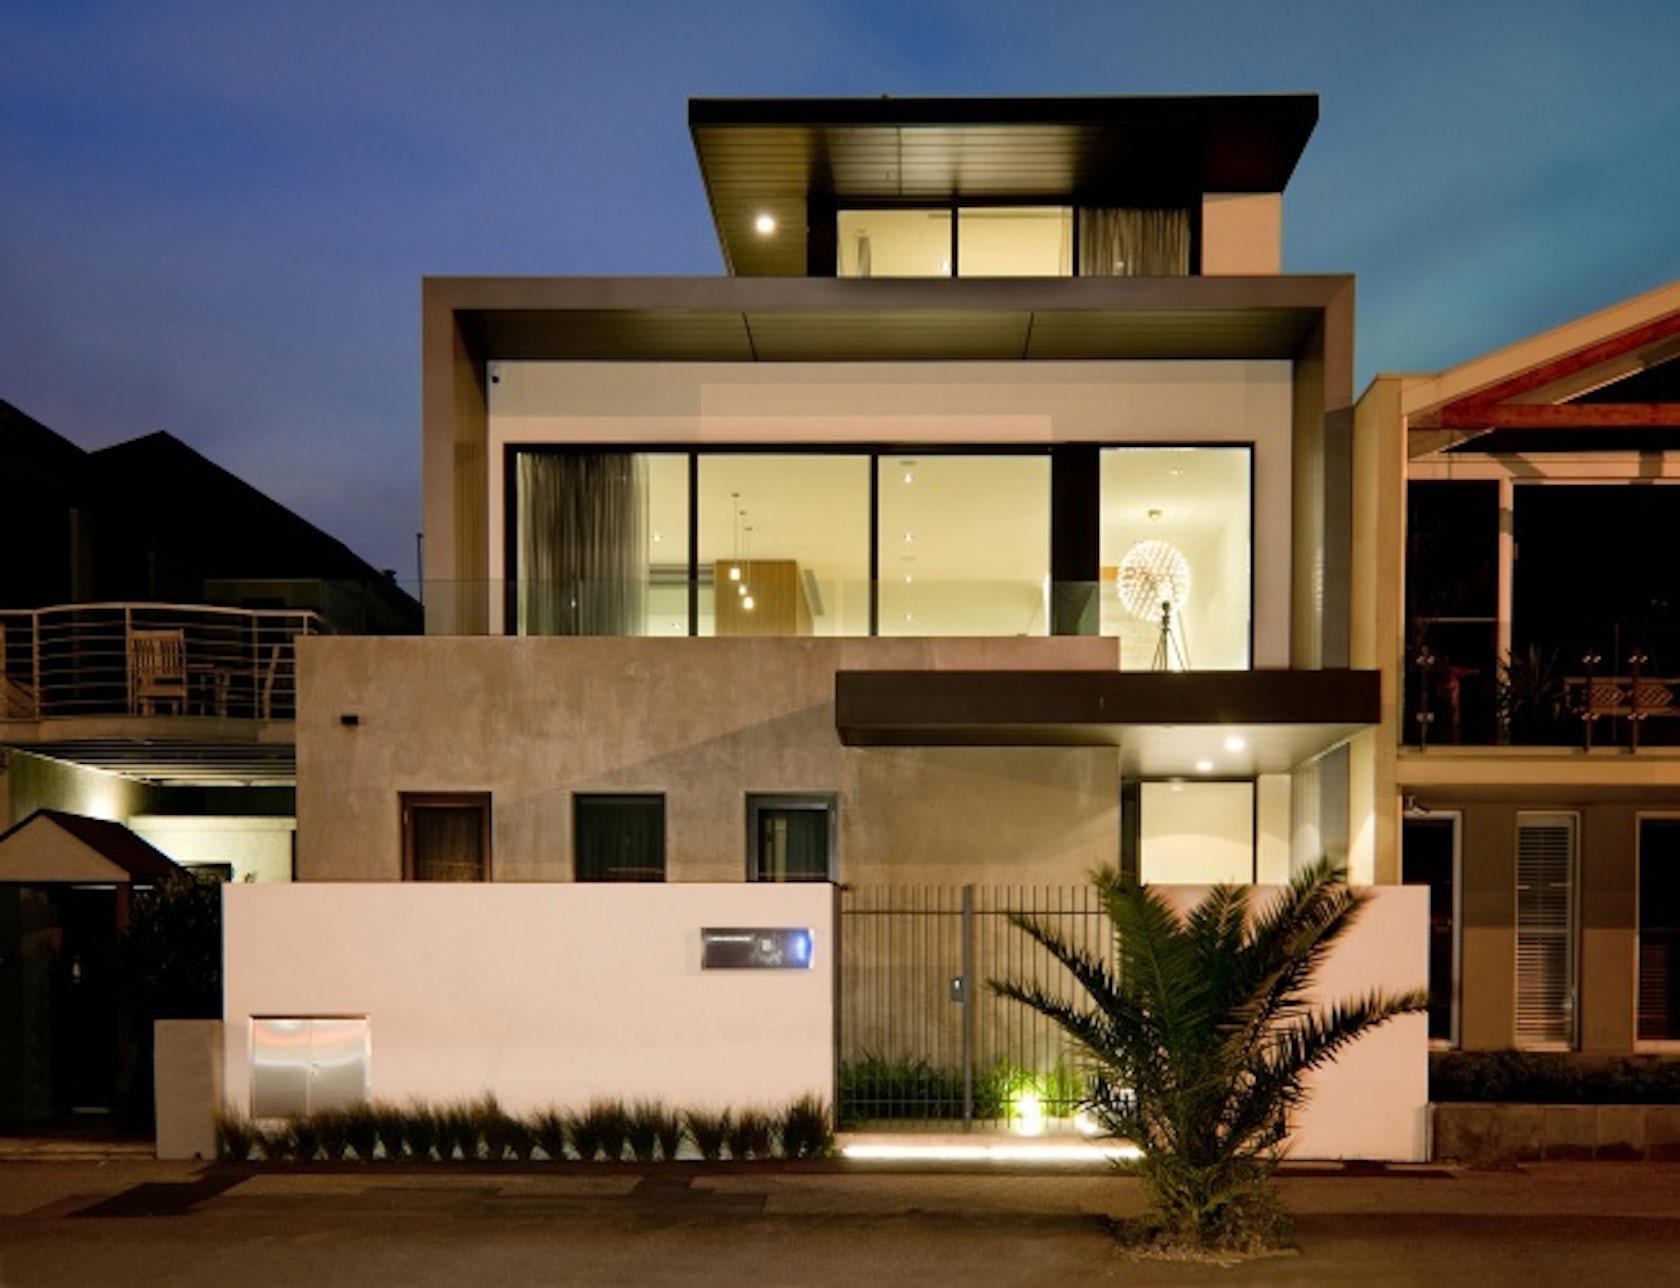 Minimalist house 1 architizer for Minimalist house instagram